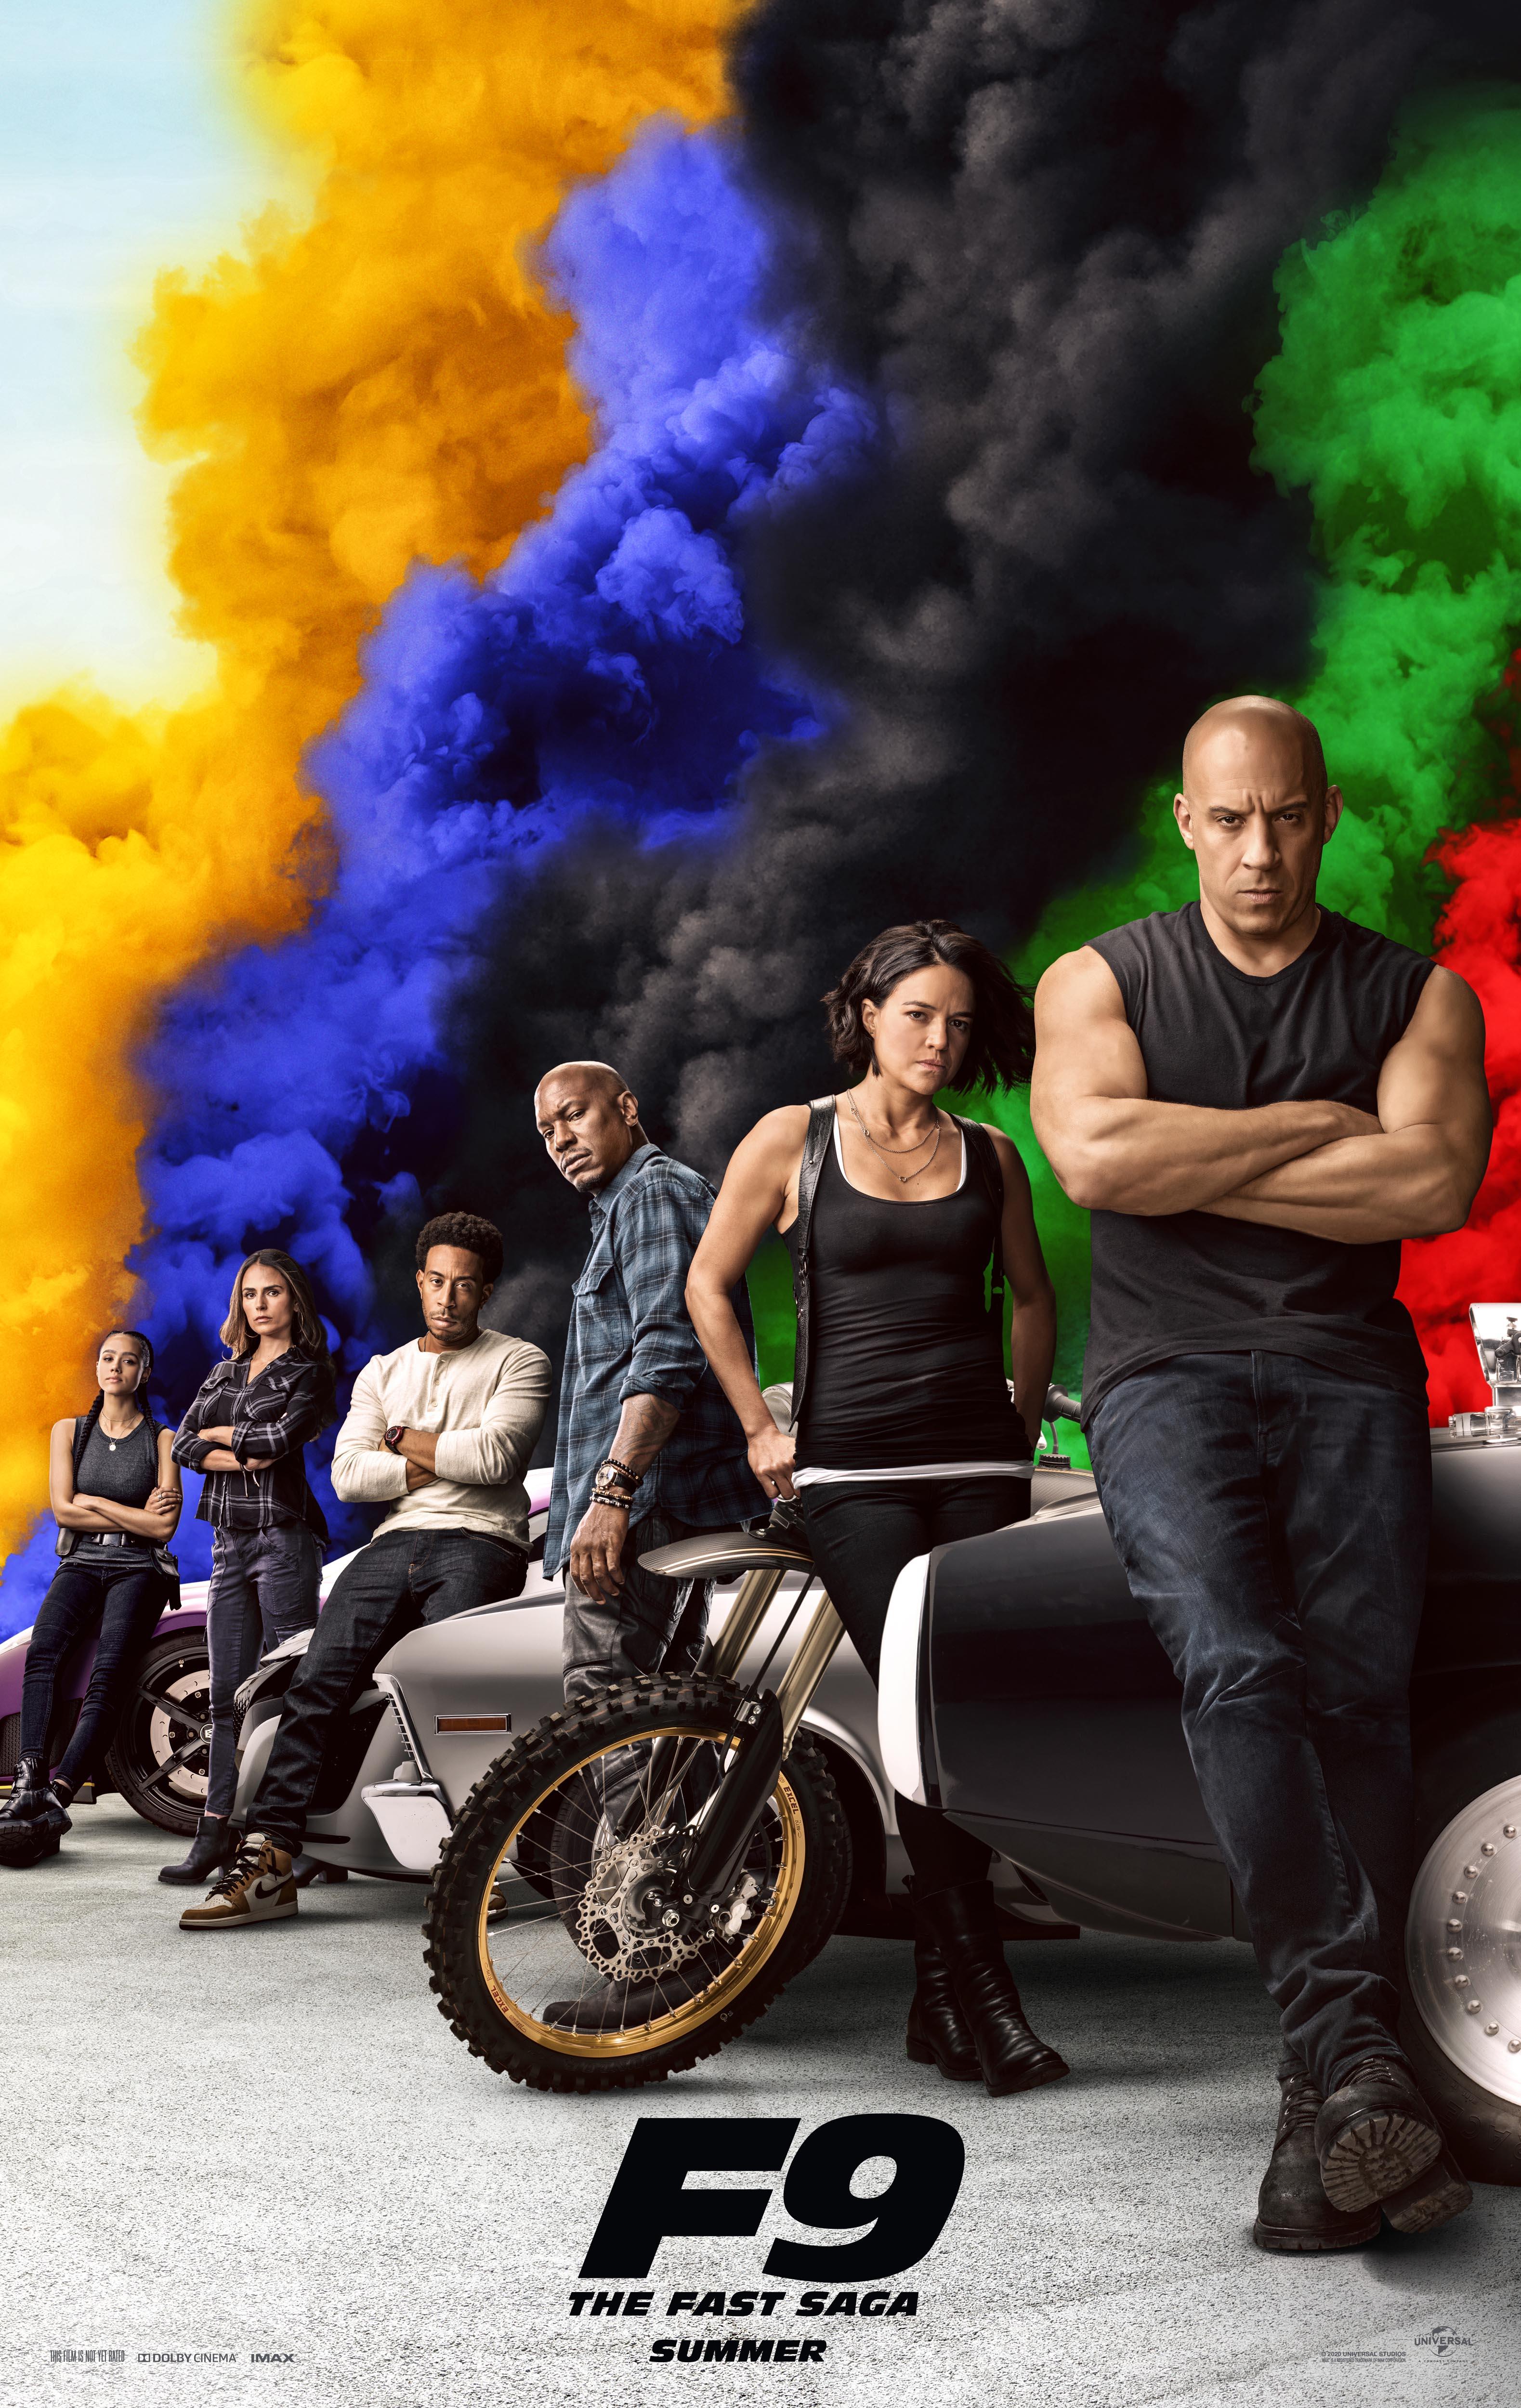 F9, Vin Diesel, Michelle Rodriguez, Tyrese Gibson, Ludacris, Jordana Brewster, Nathalie Emmanuel